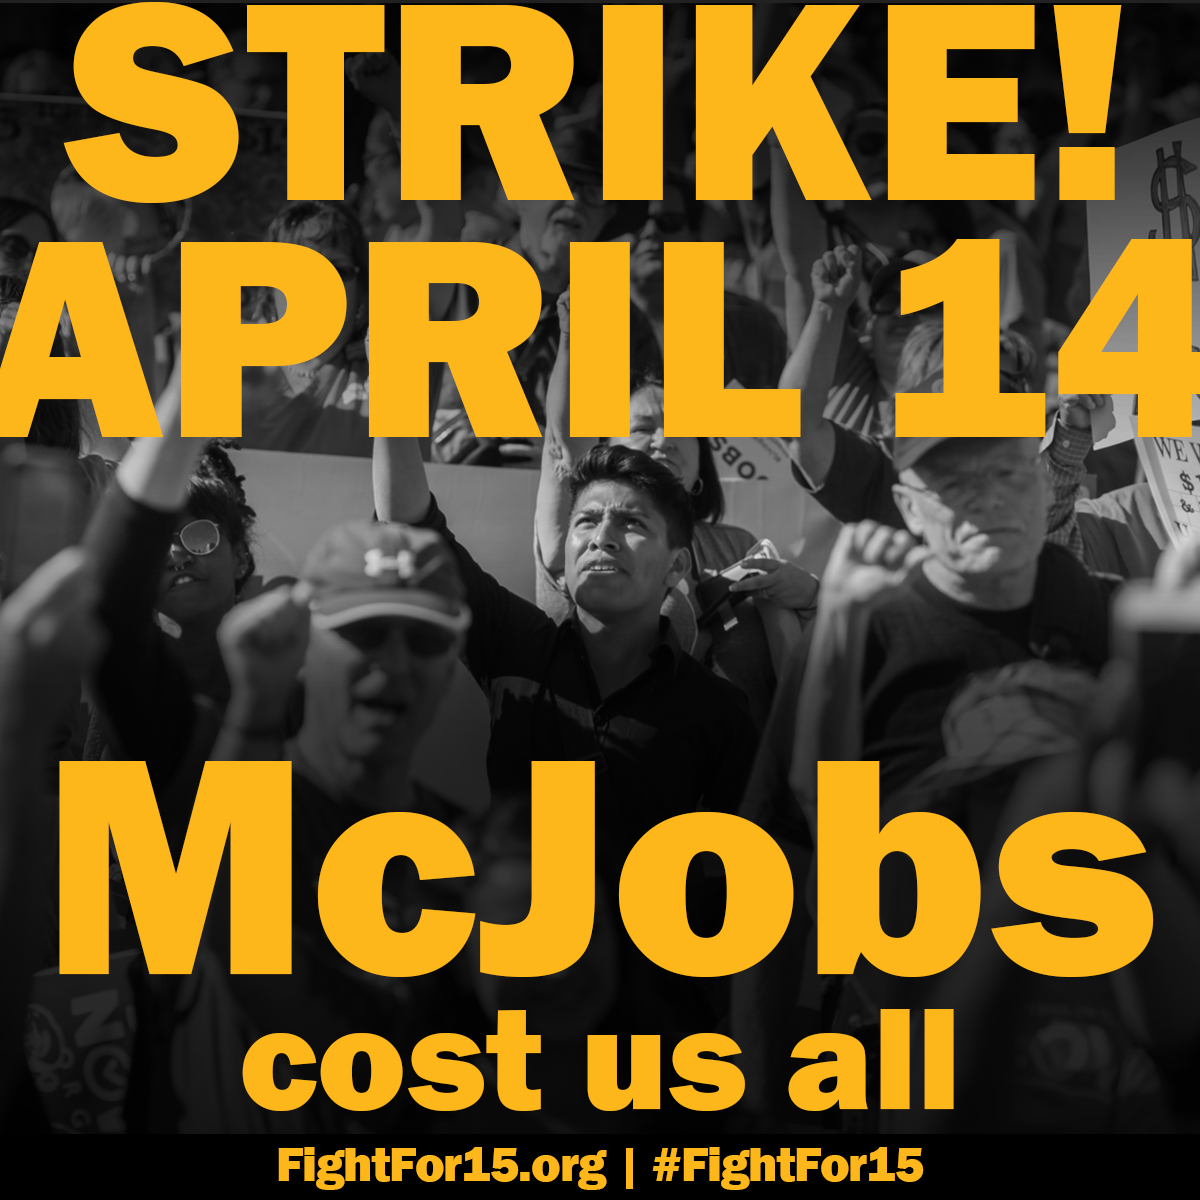 FightFor15 Global Strikes Against McJobs